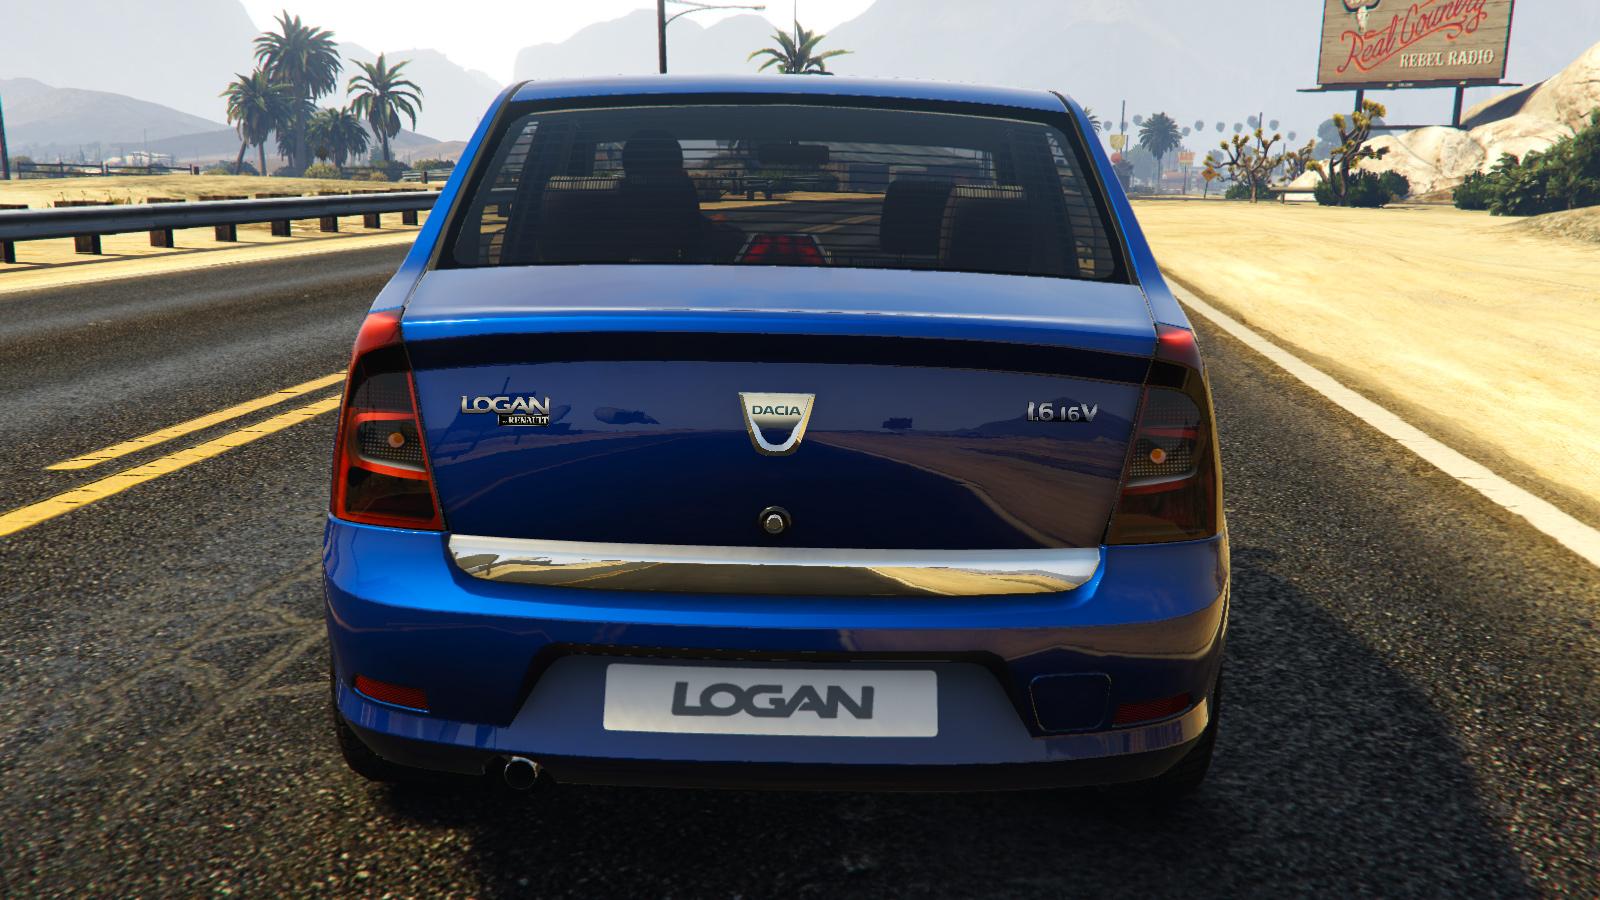 2008 Dacia Logan для GTA V - Скриншот 3